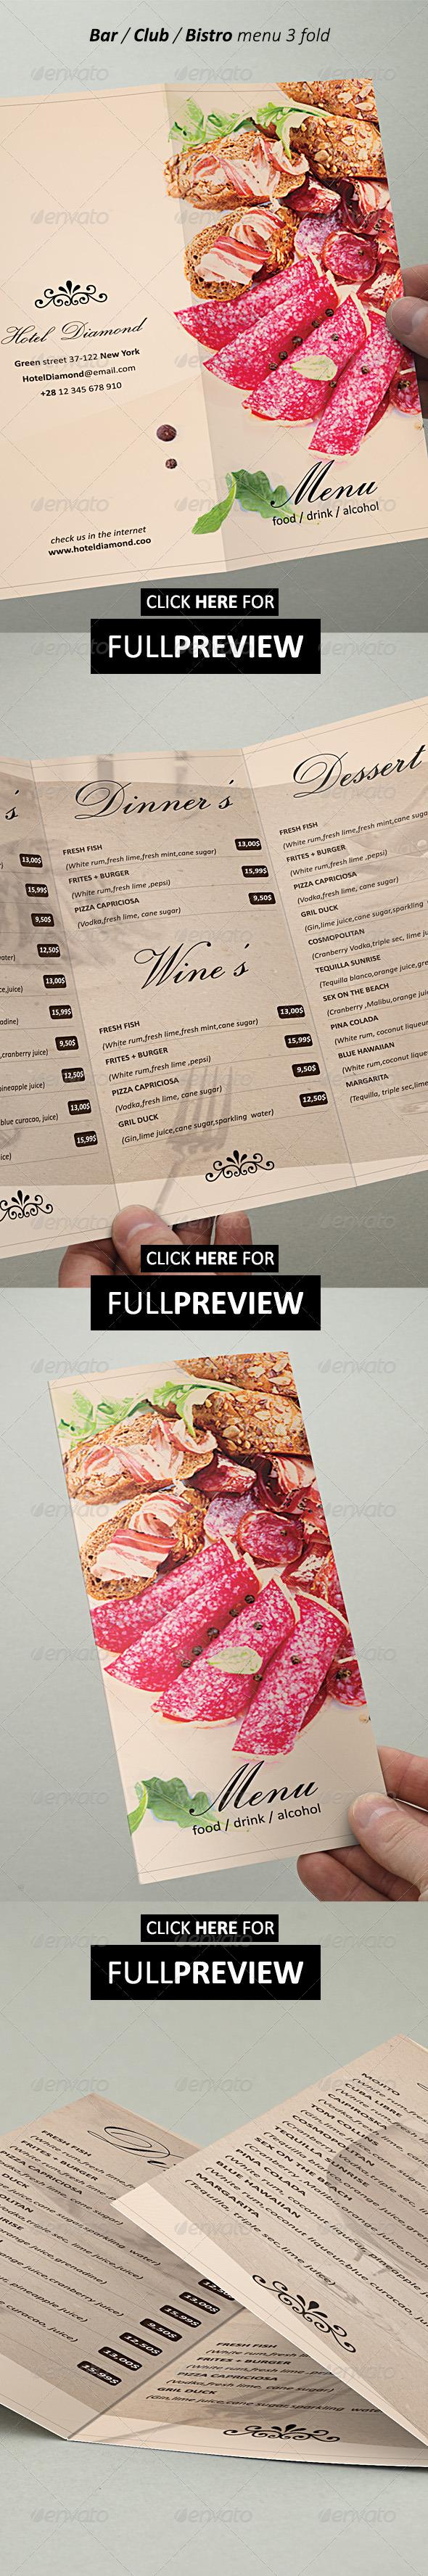 GraphicRiver Restaurant Menu Brochure 3 Fold 5179521